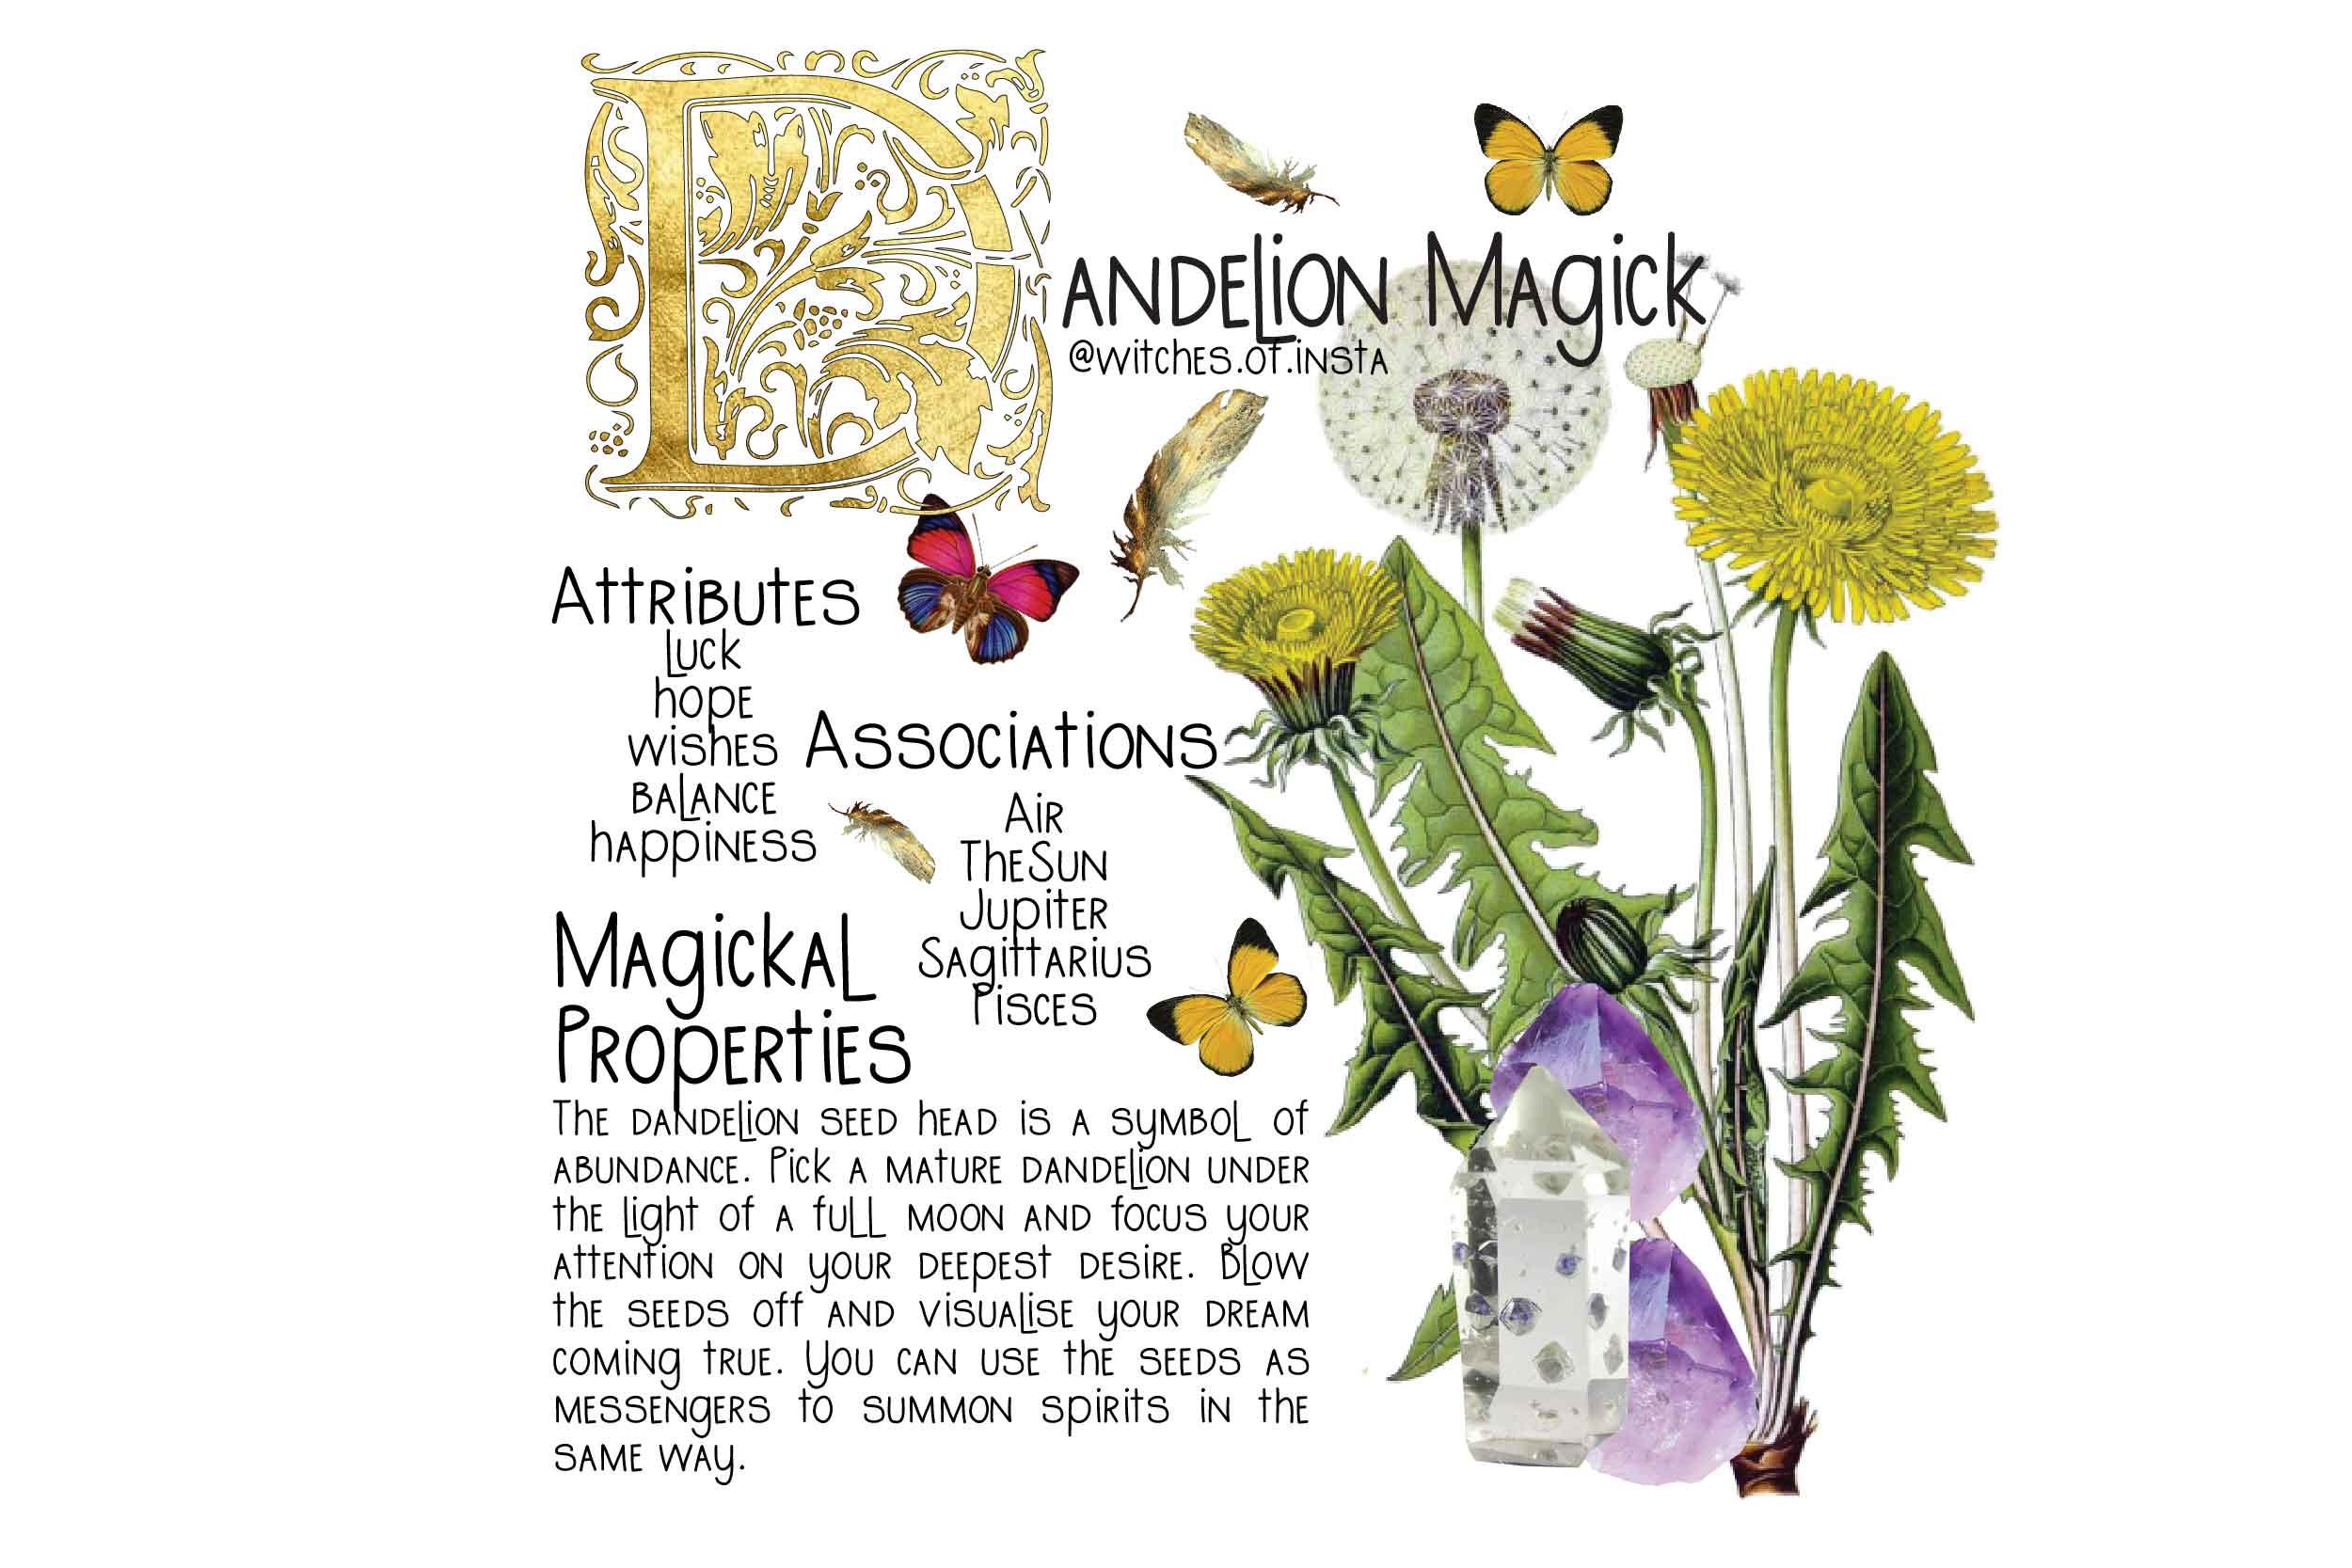 Dandelion Magick